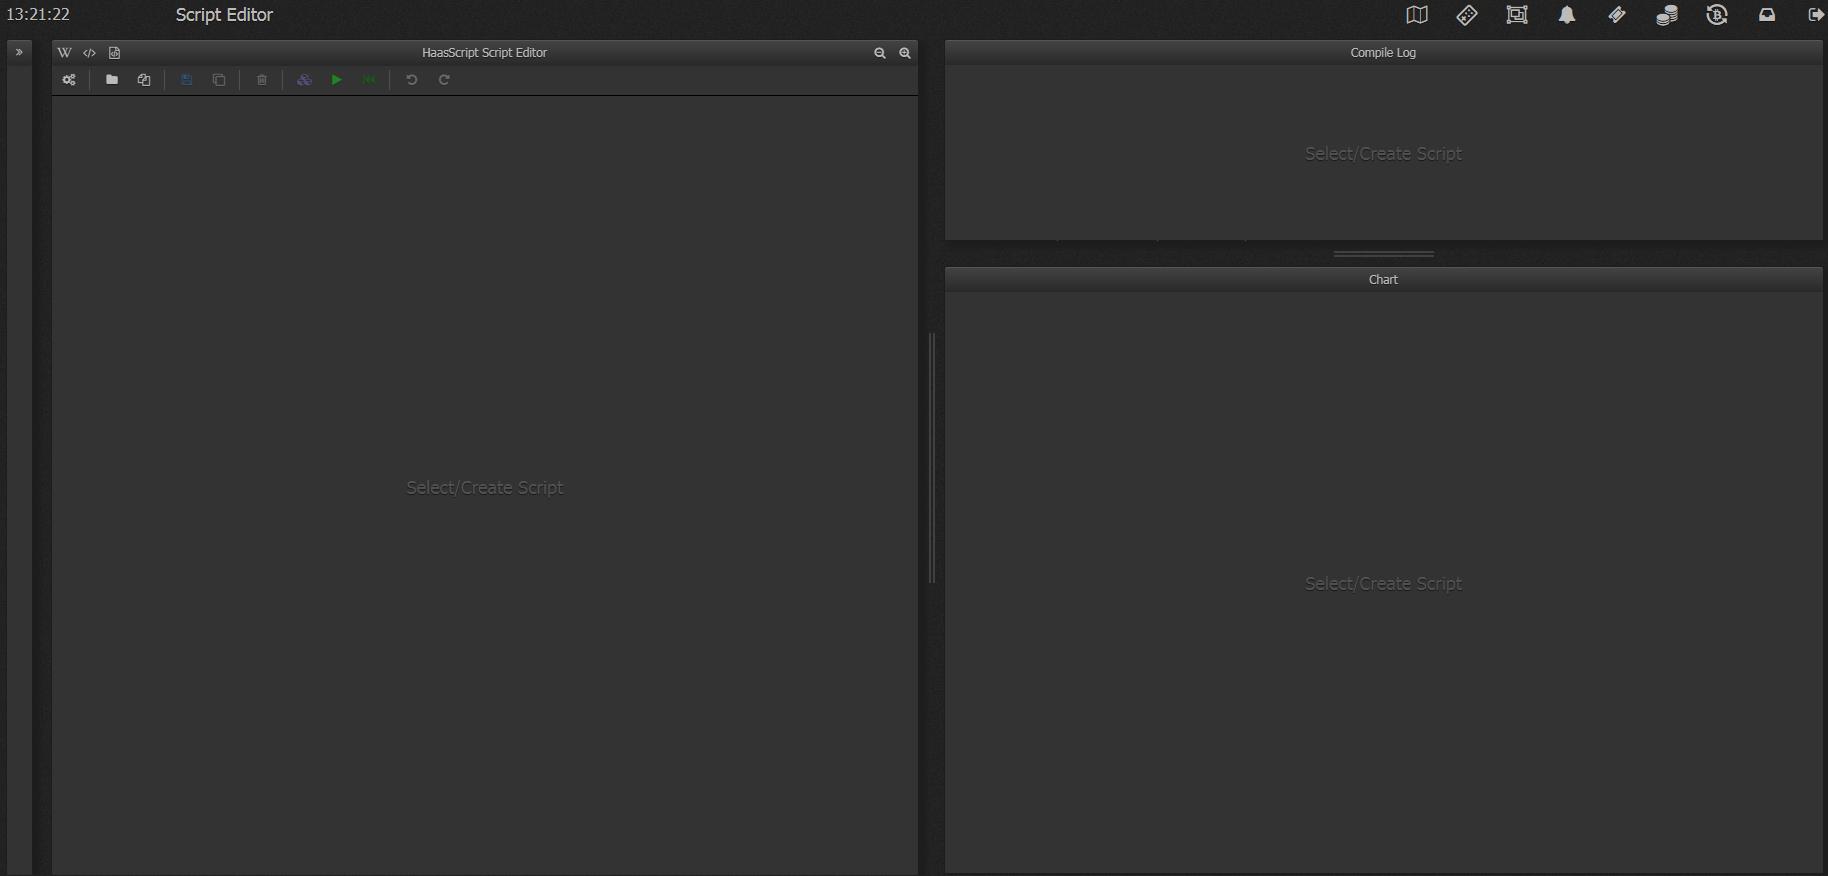 haas-script-blank-editor